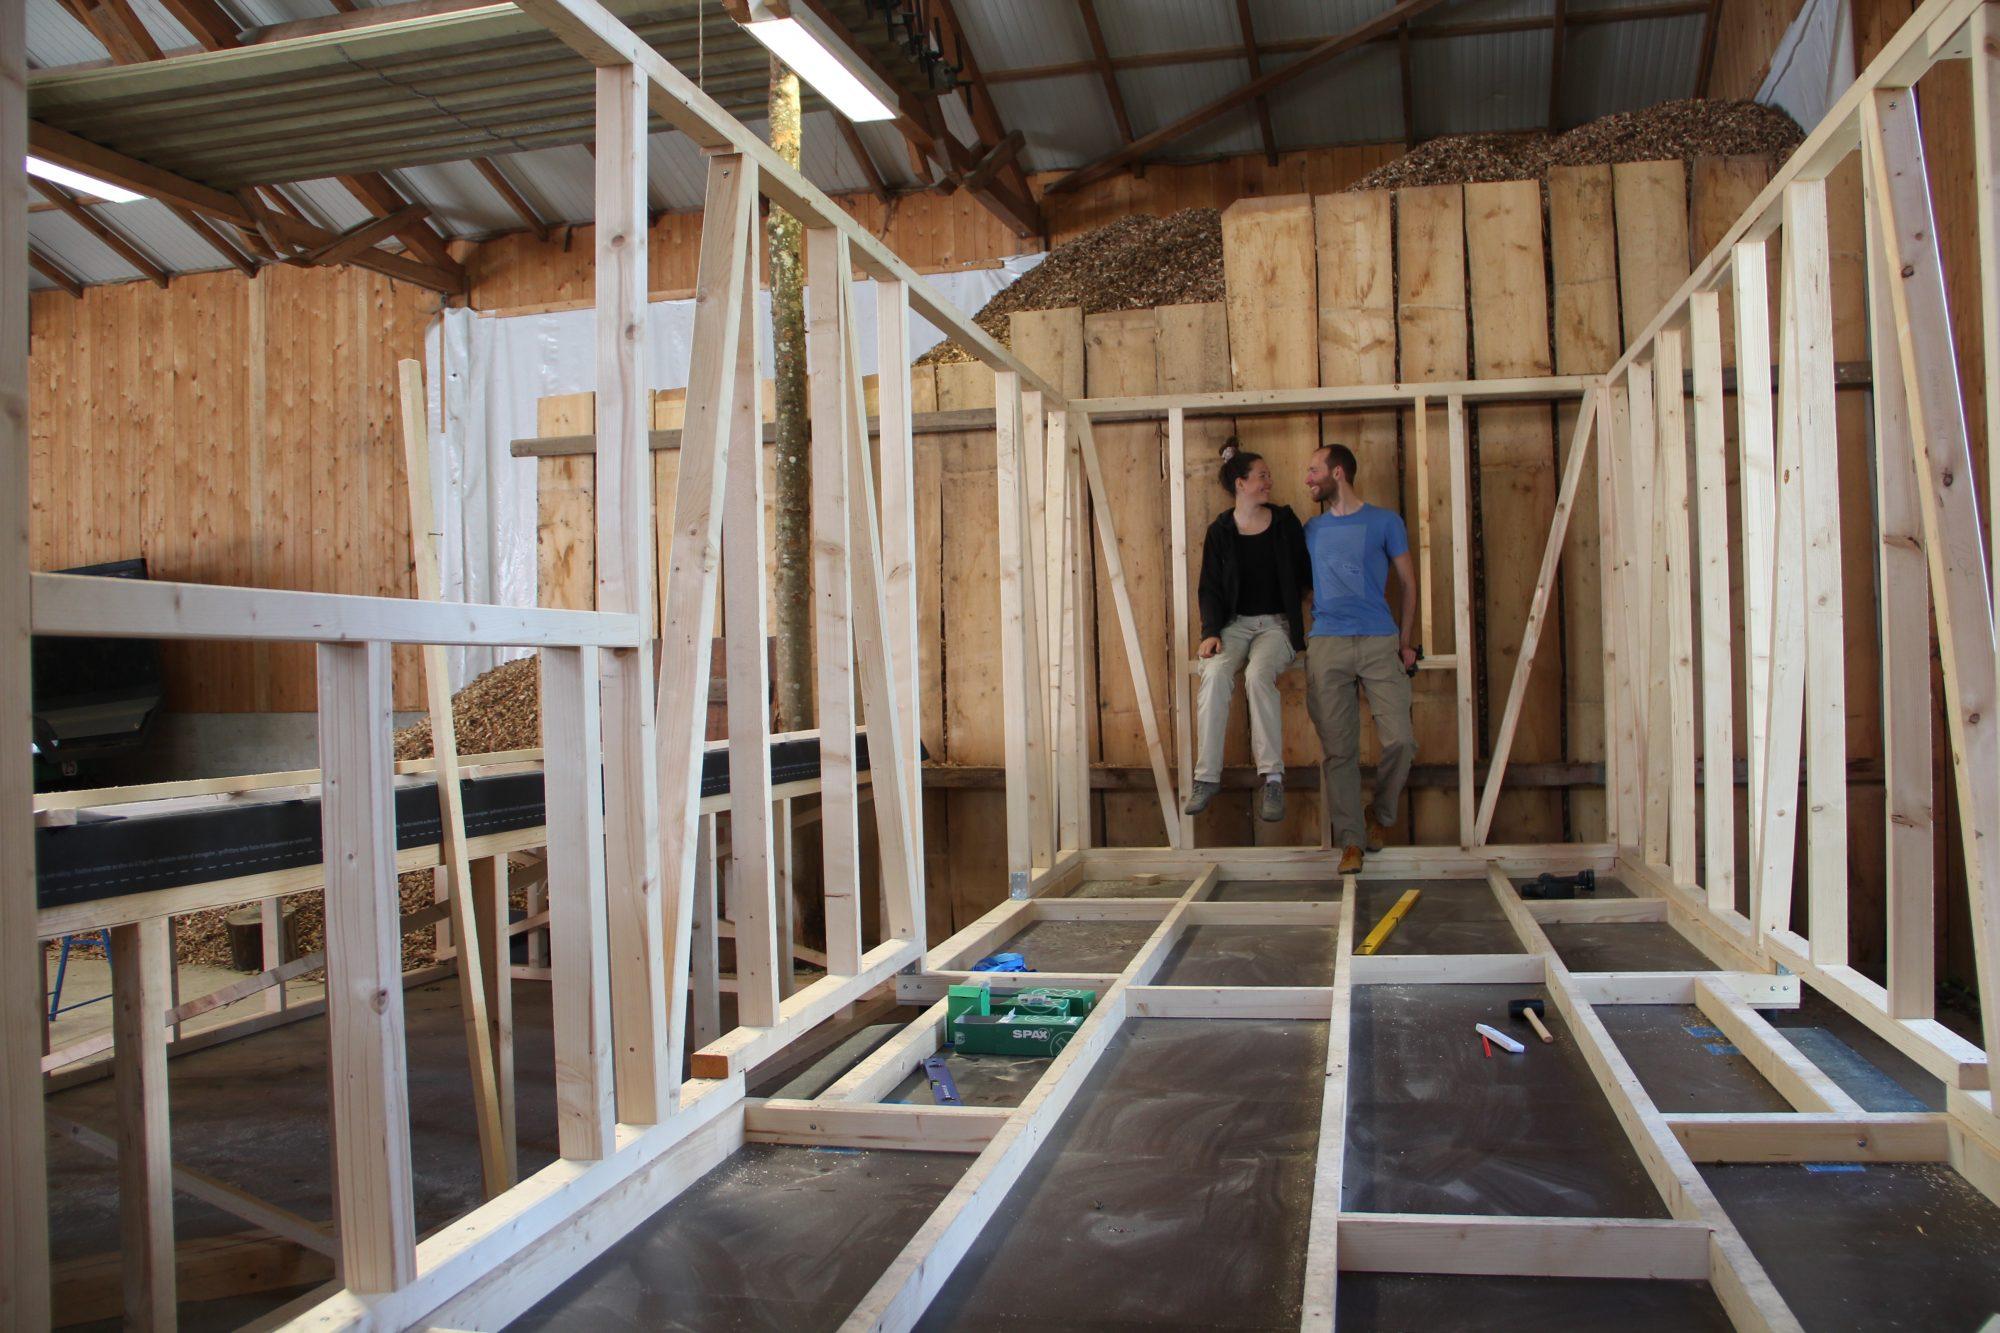 st nderwerk bauen concection. Black Bedroom Furniture Sets. Home Design Ideas